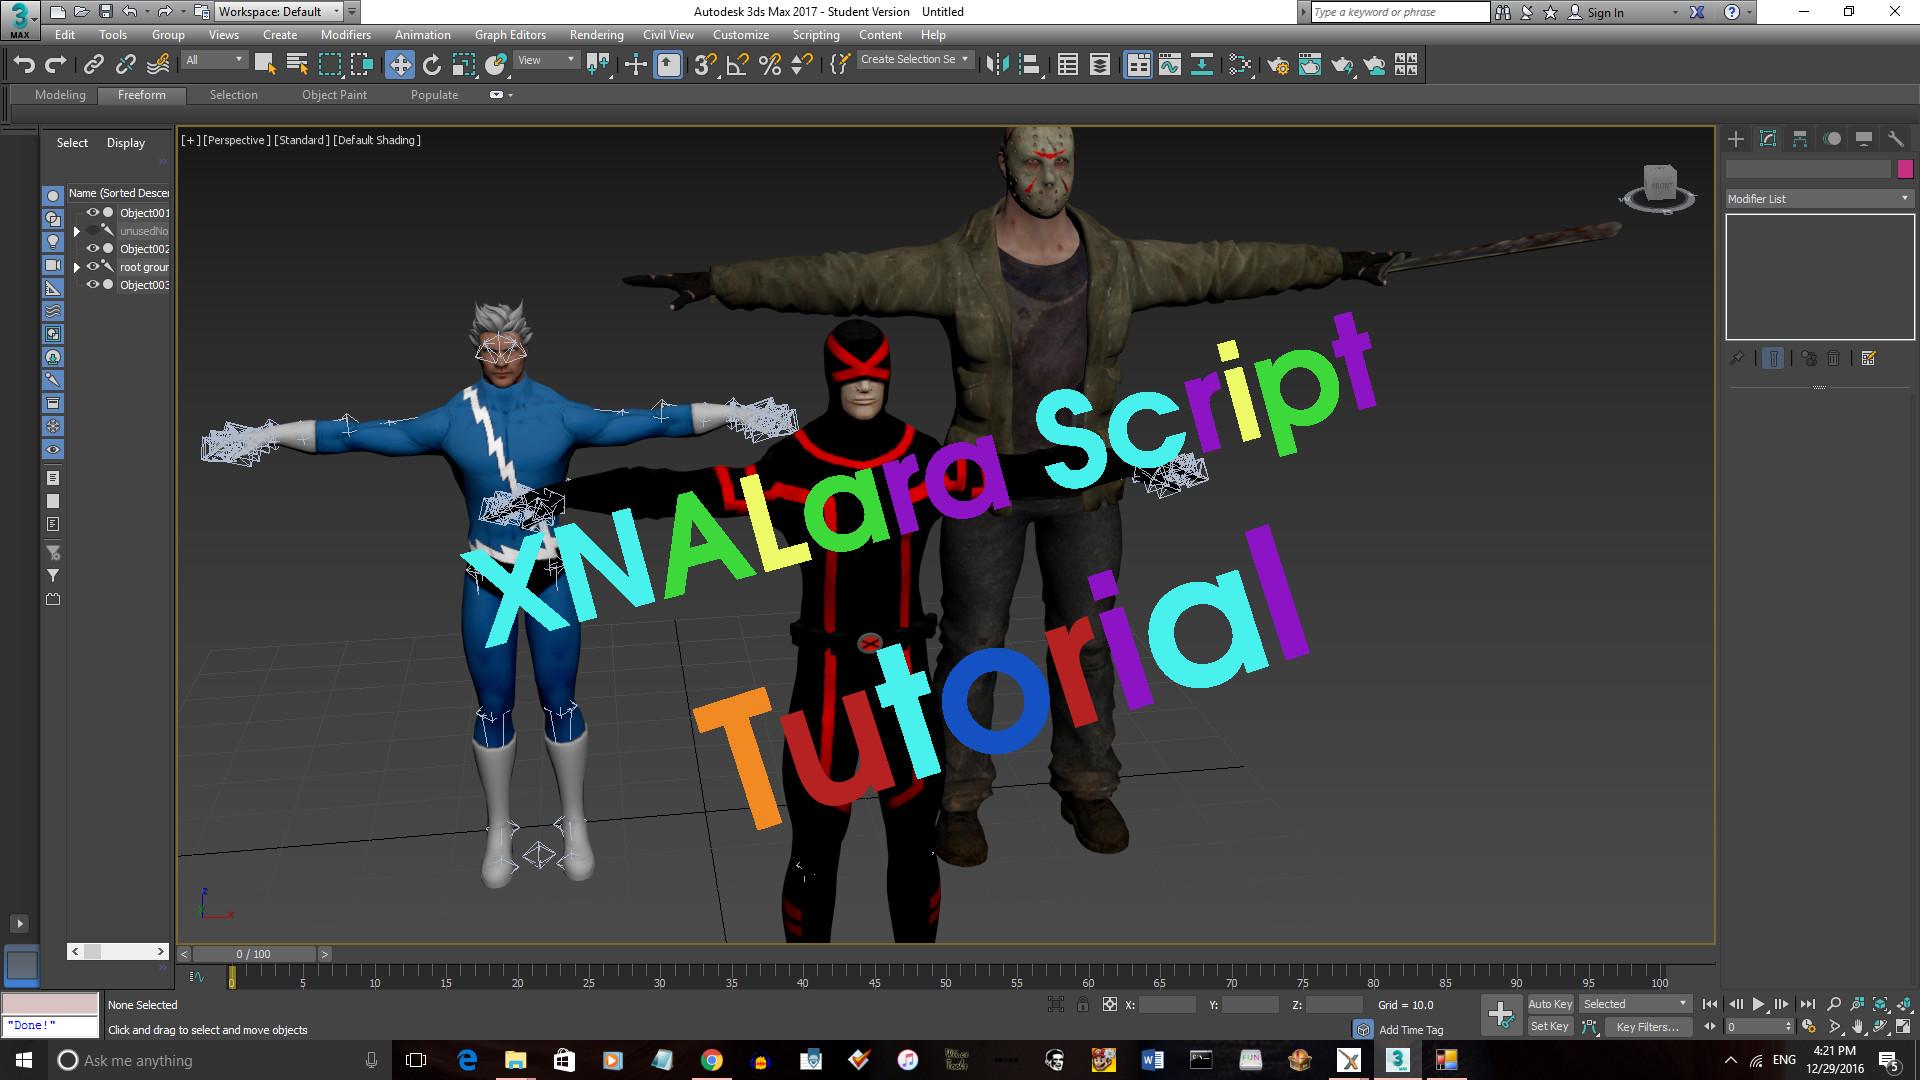 Xnalara script for 3dsmax tutorial super smash bros for wii u xnalara script for 3dsmax tutorial ccuart Gallery